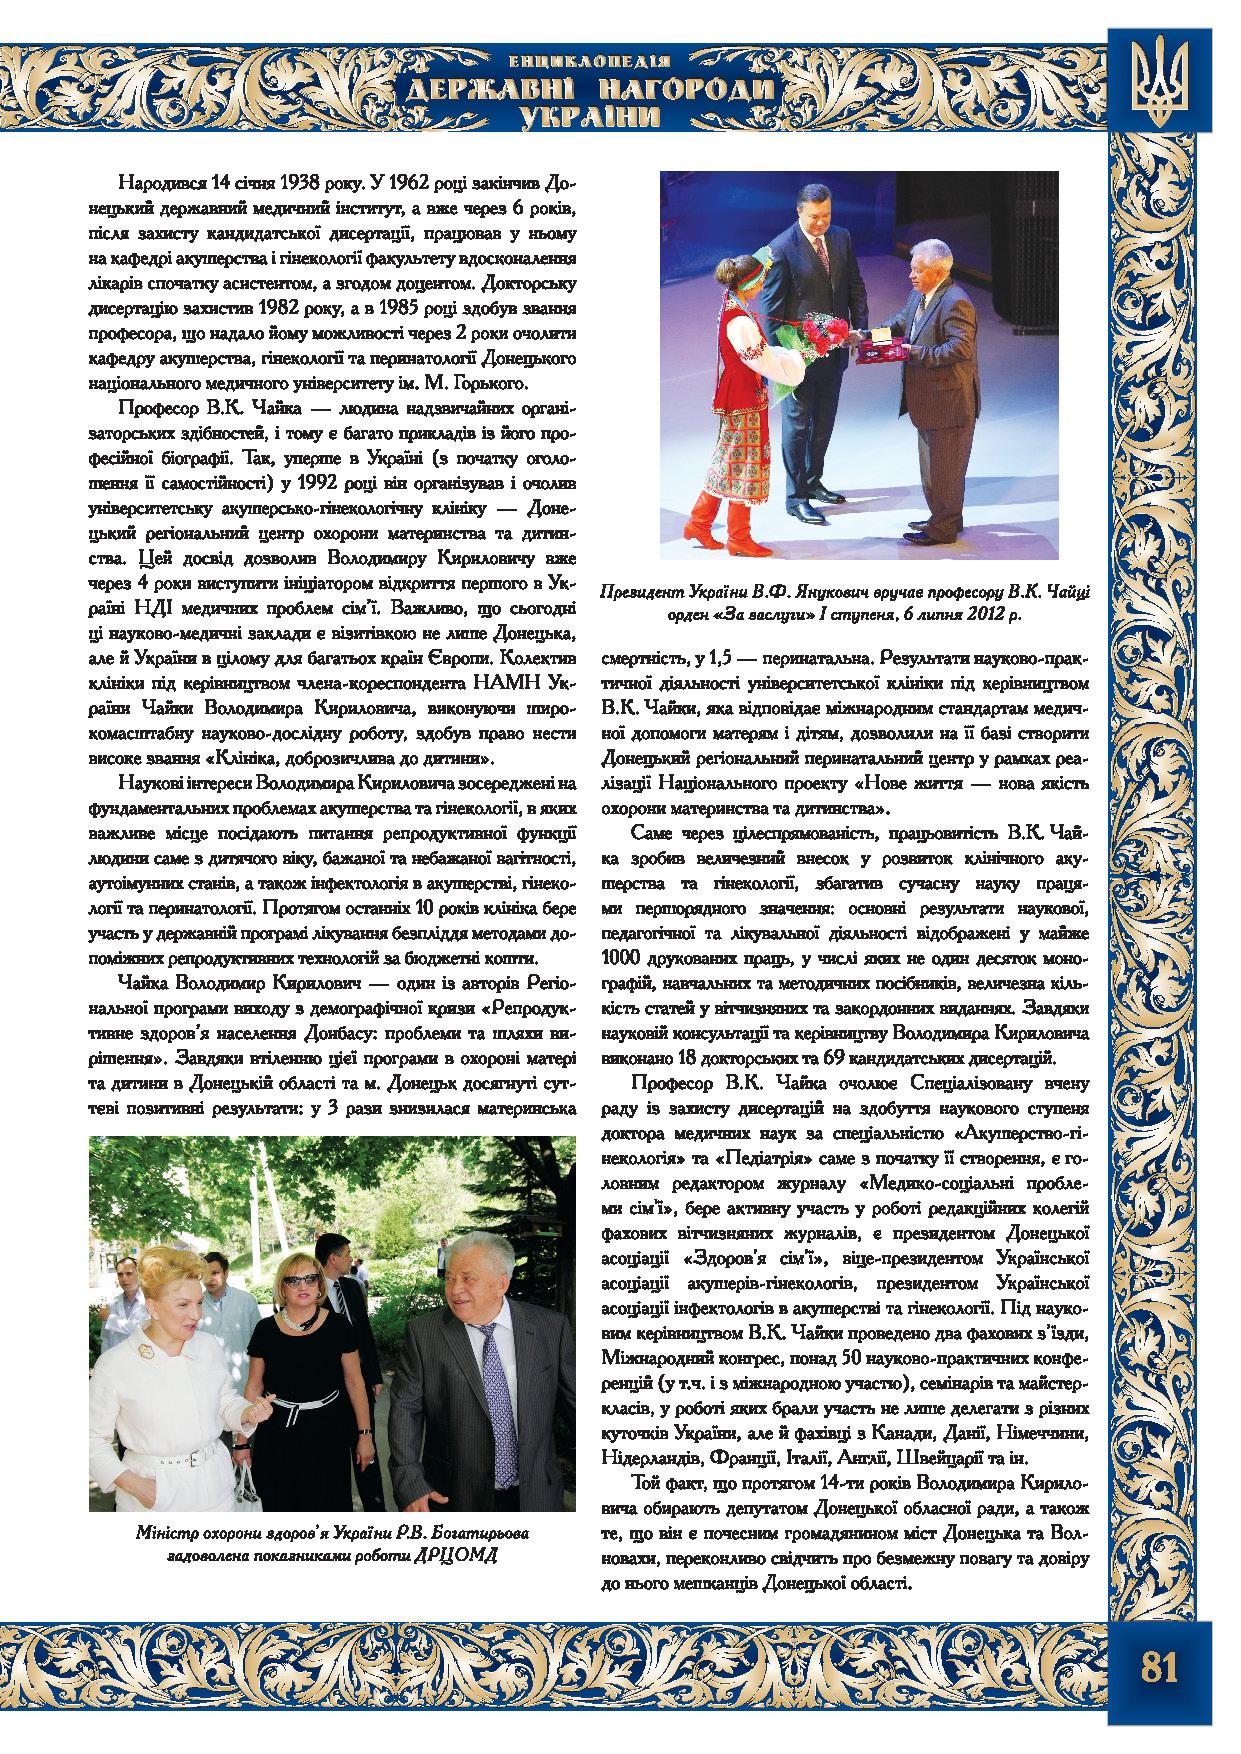 Чайка Володимир Кирилович